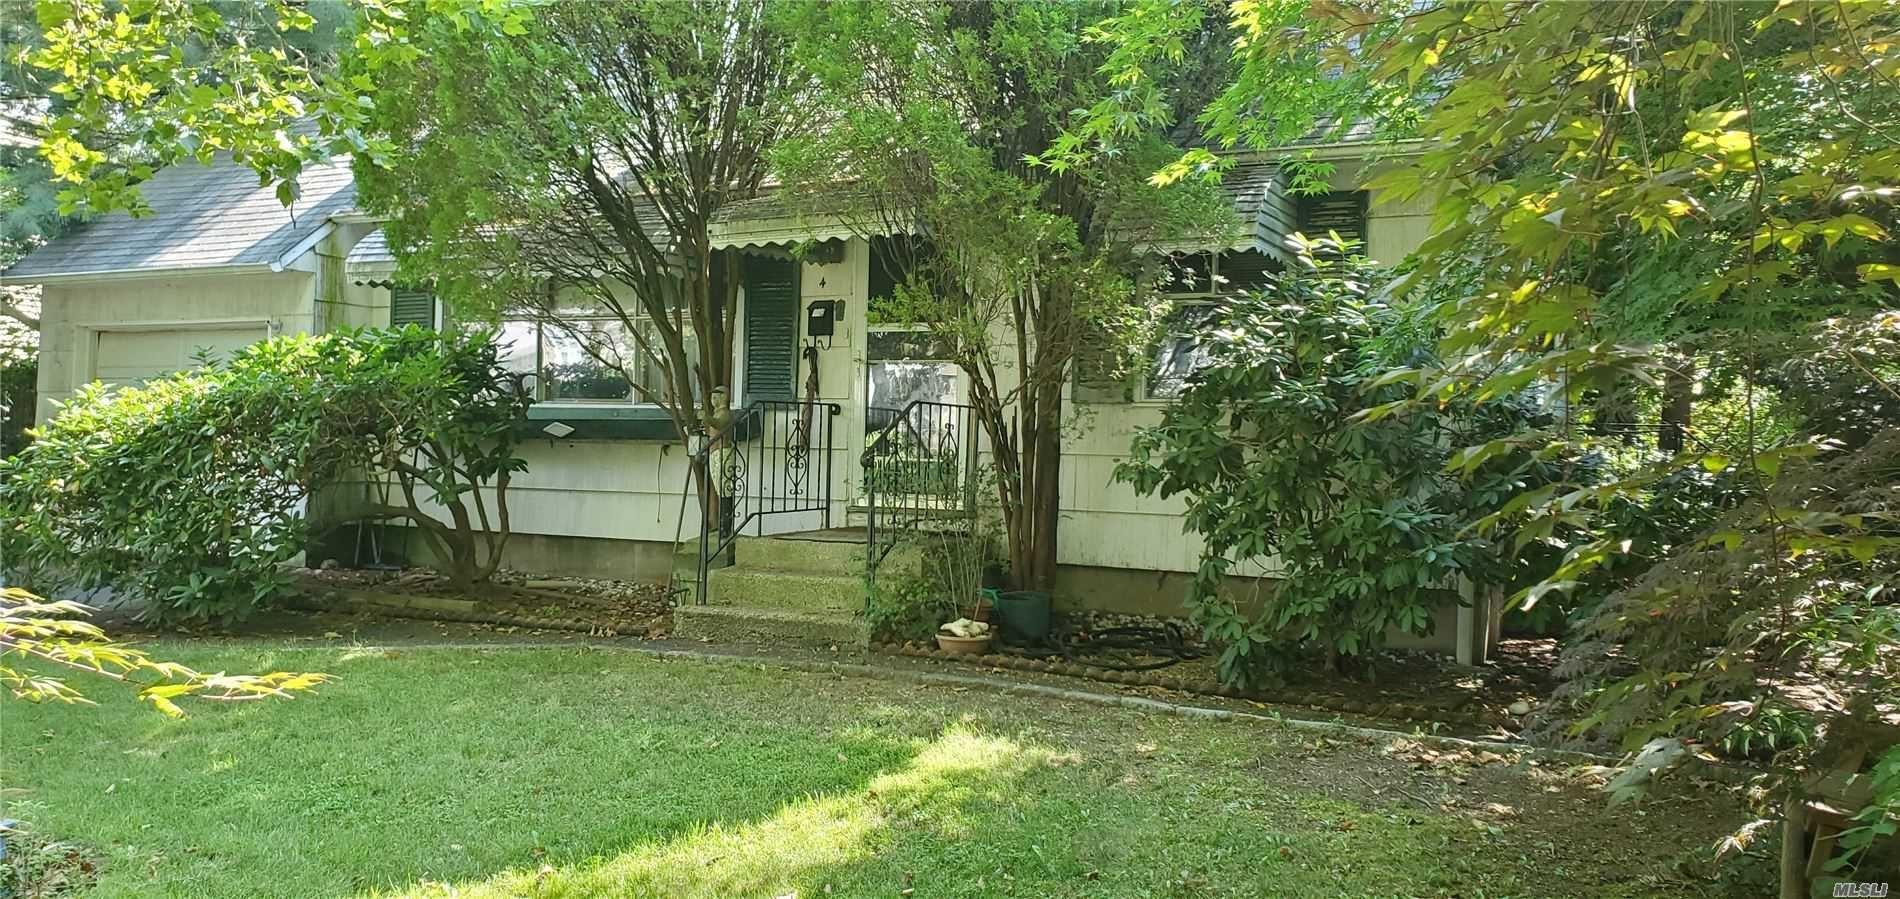 4 Sun Haven Lane, Commack, NY 11725 - MLS#: 3241380